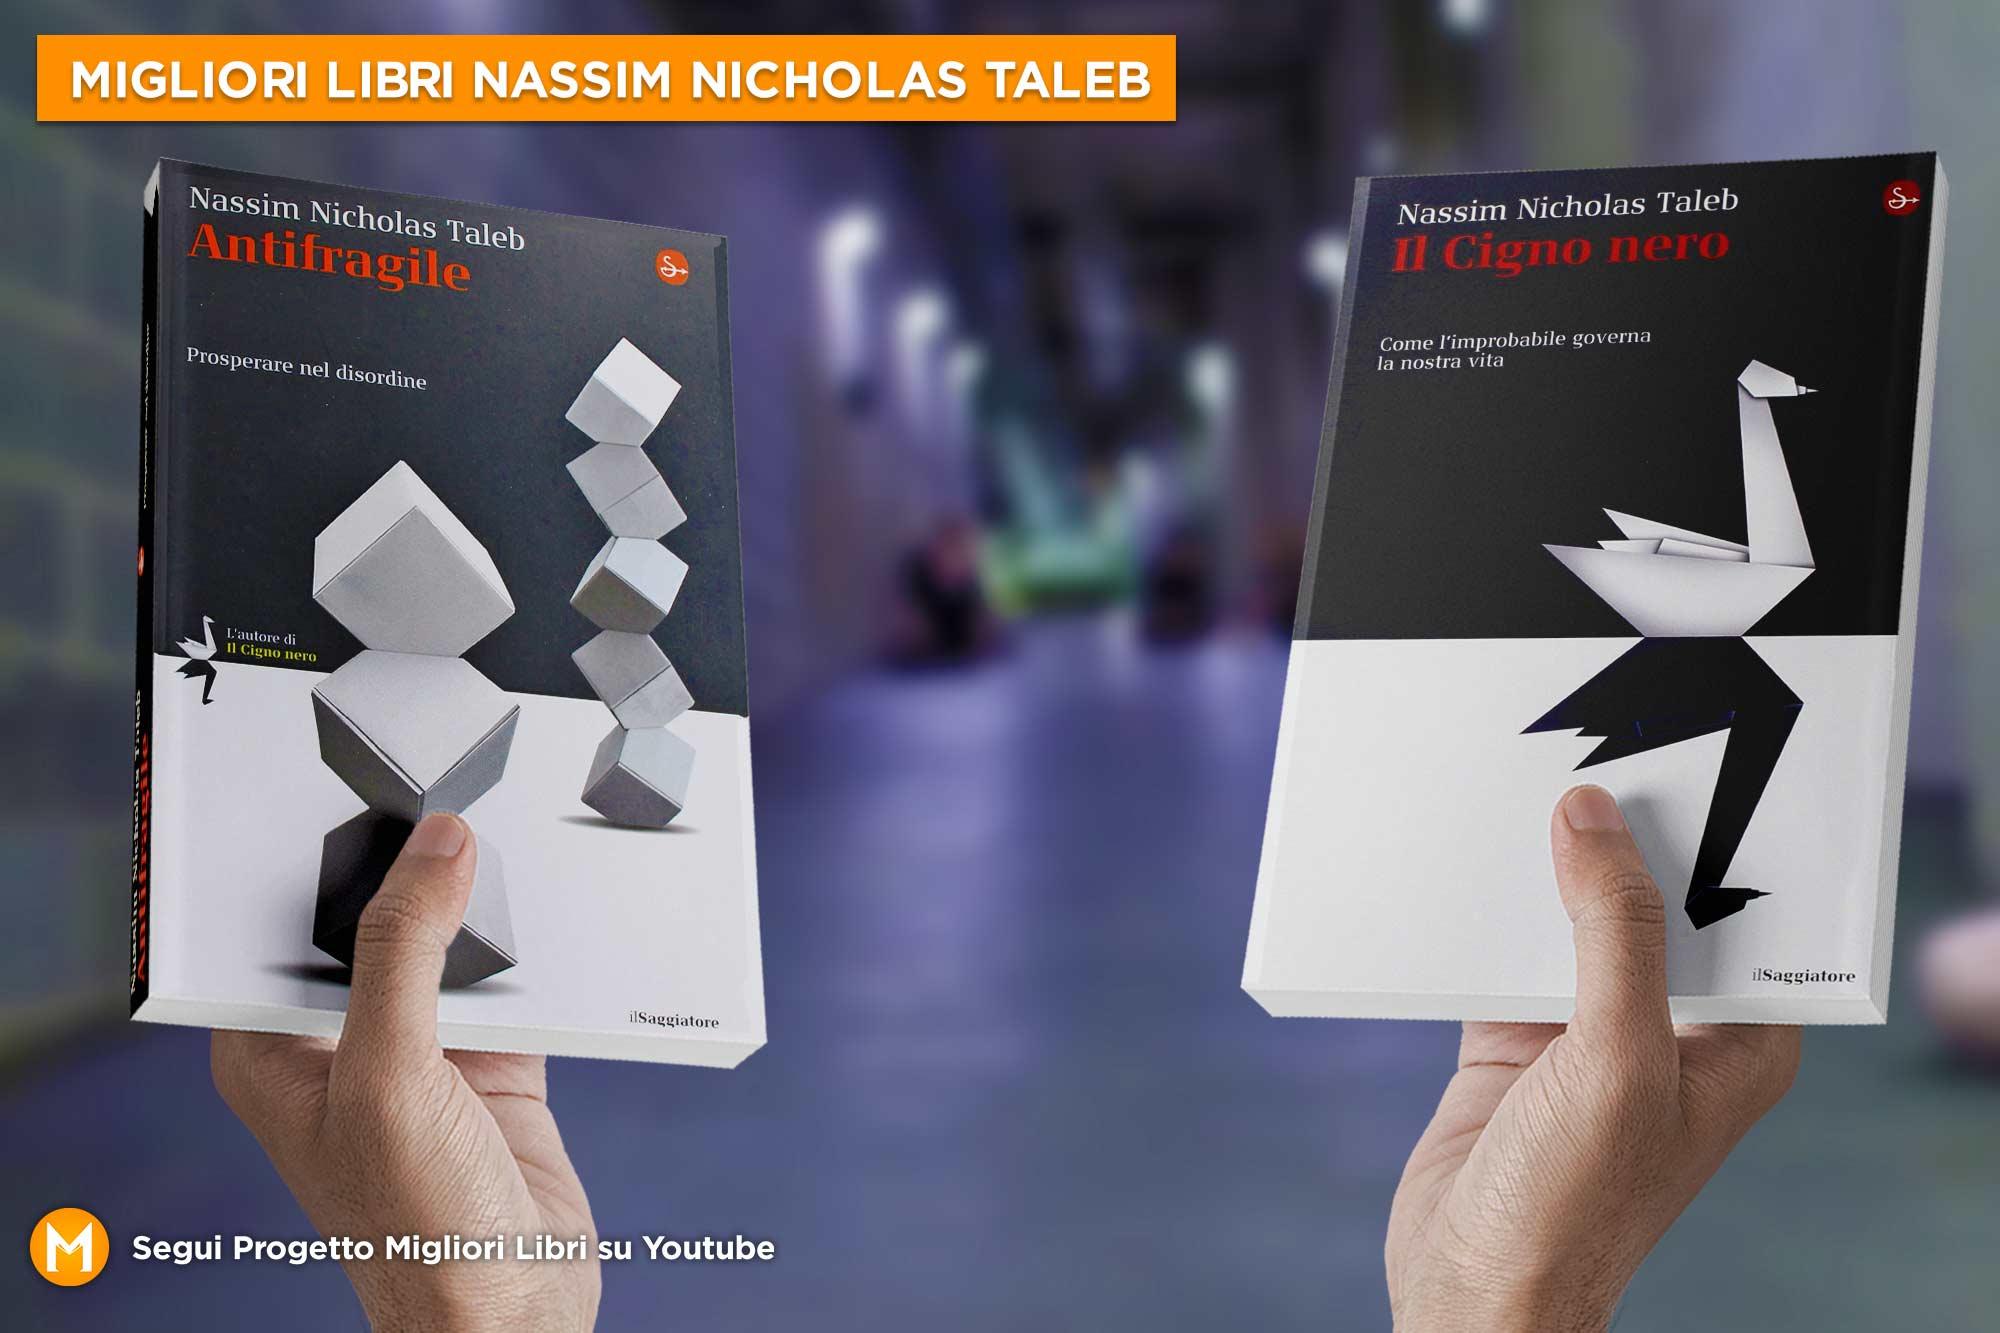 migliori-libri-nassim-Nicholas-Taleb